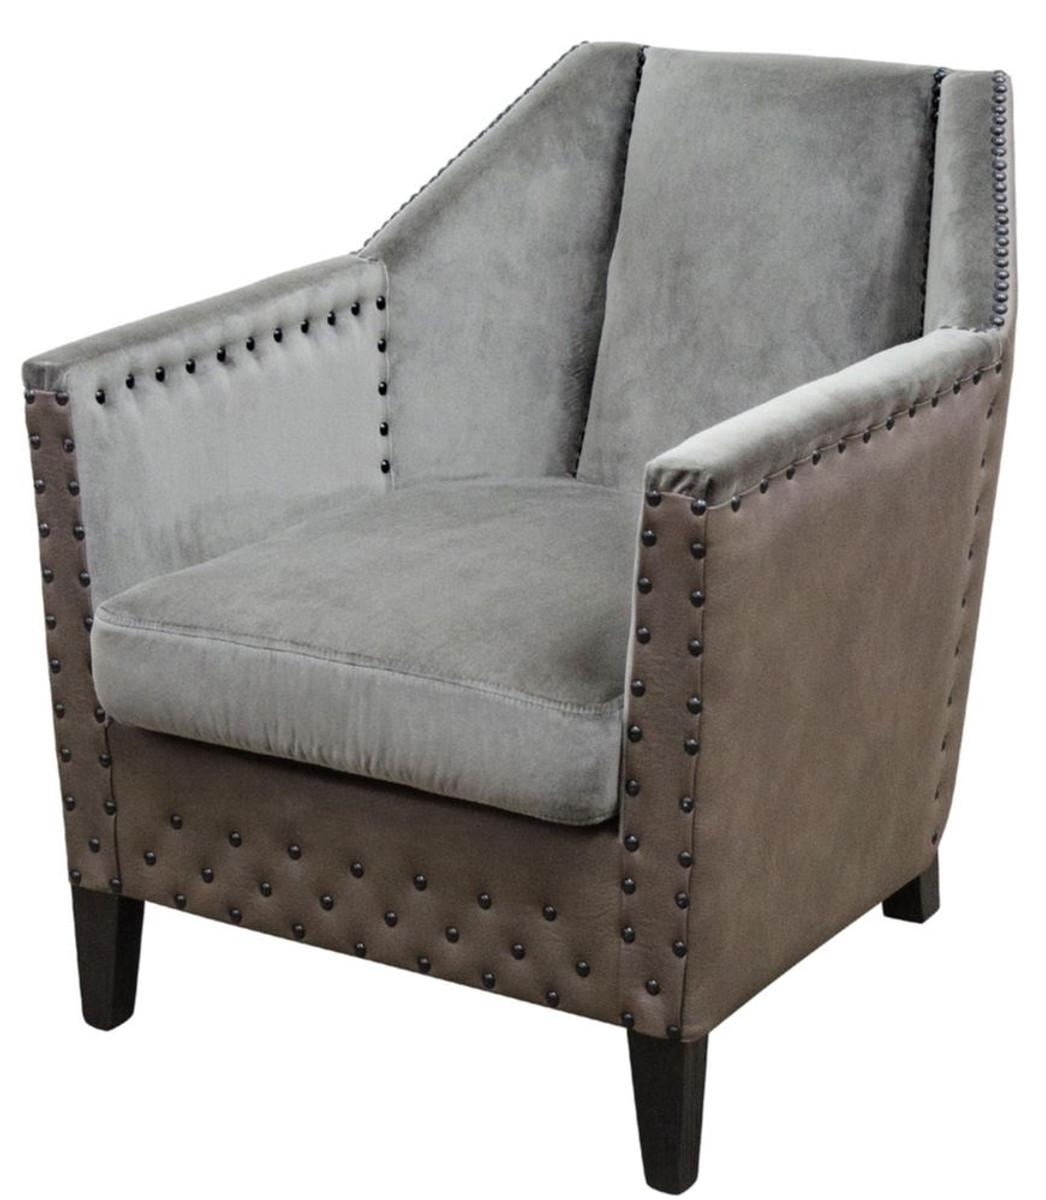 casa padrino luxus sessel grau braun schwarz 61 x 71 x h 69 cm hotel restaurant m bel. Black Bedroom Furniture Sets. Home Design Ideas